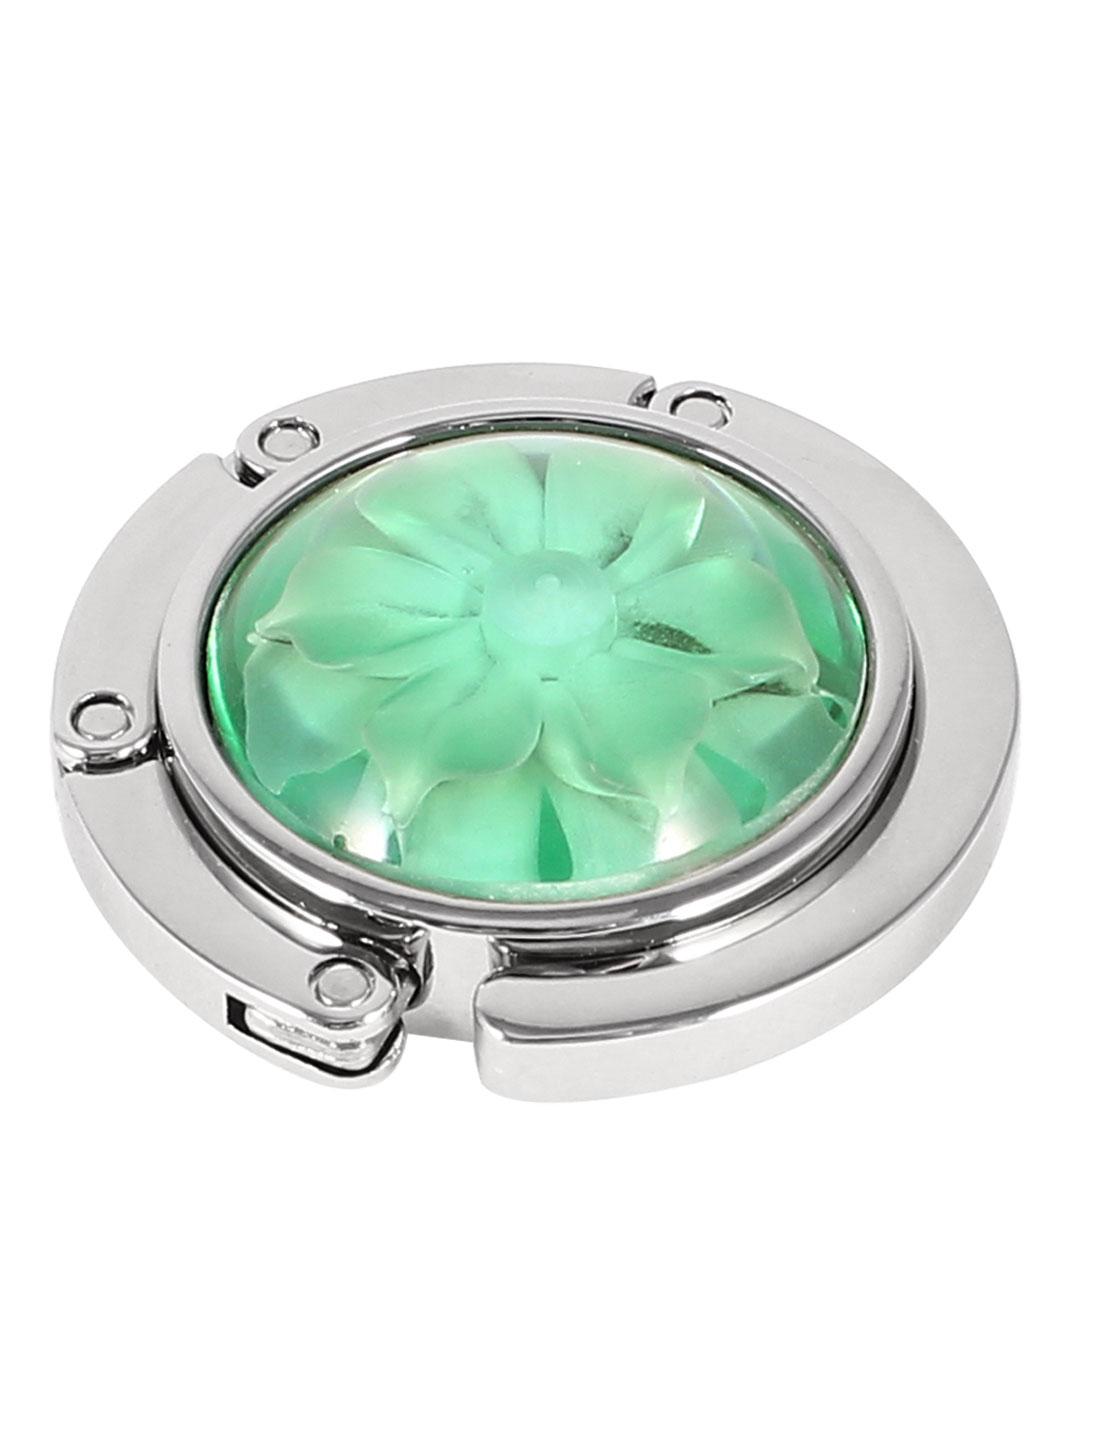 Women Floral Decor Foldable Round Handbag Purse Hook Green Silver Tone